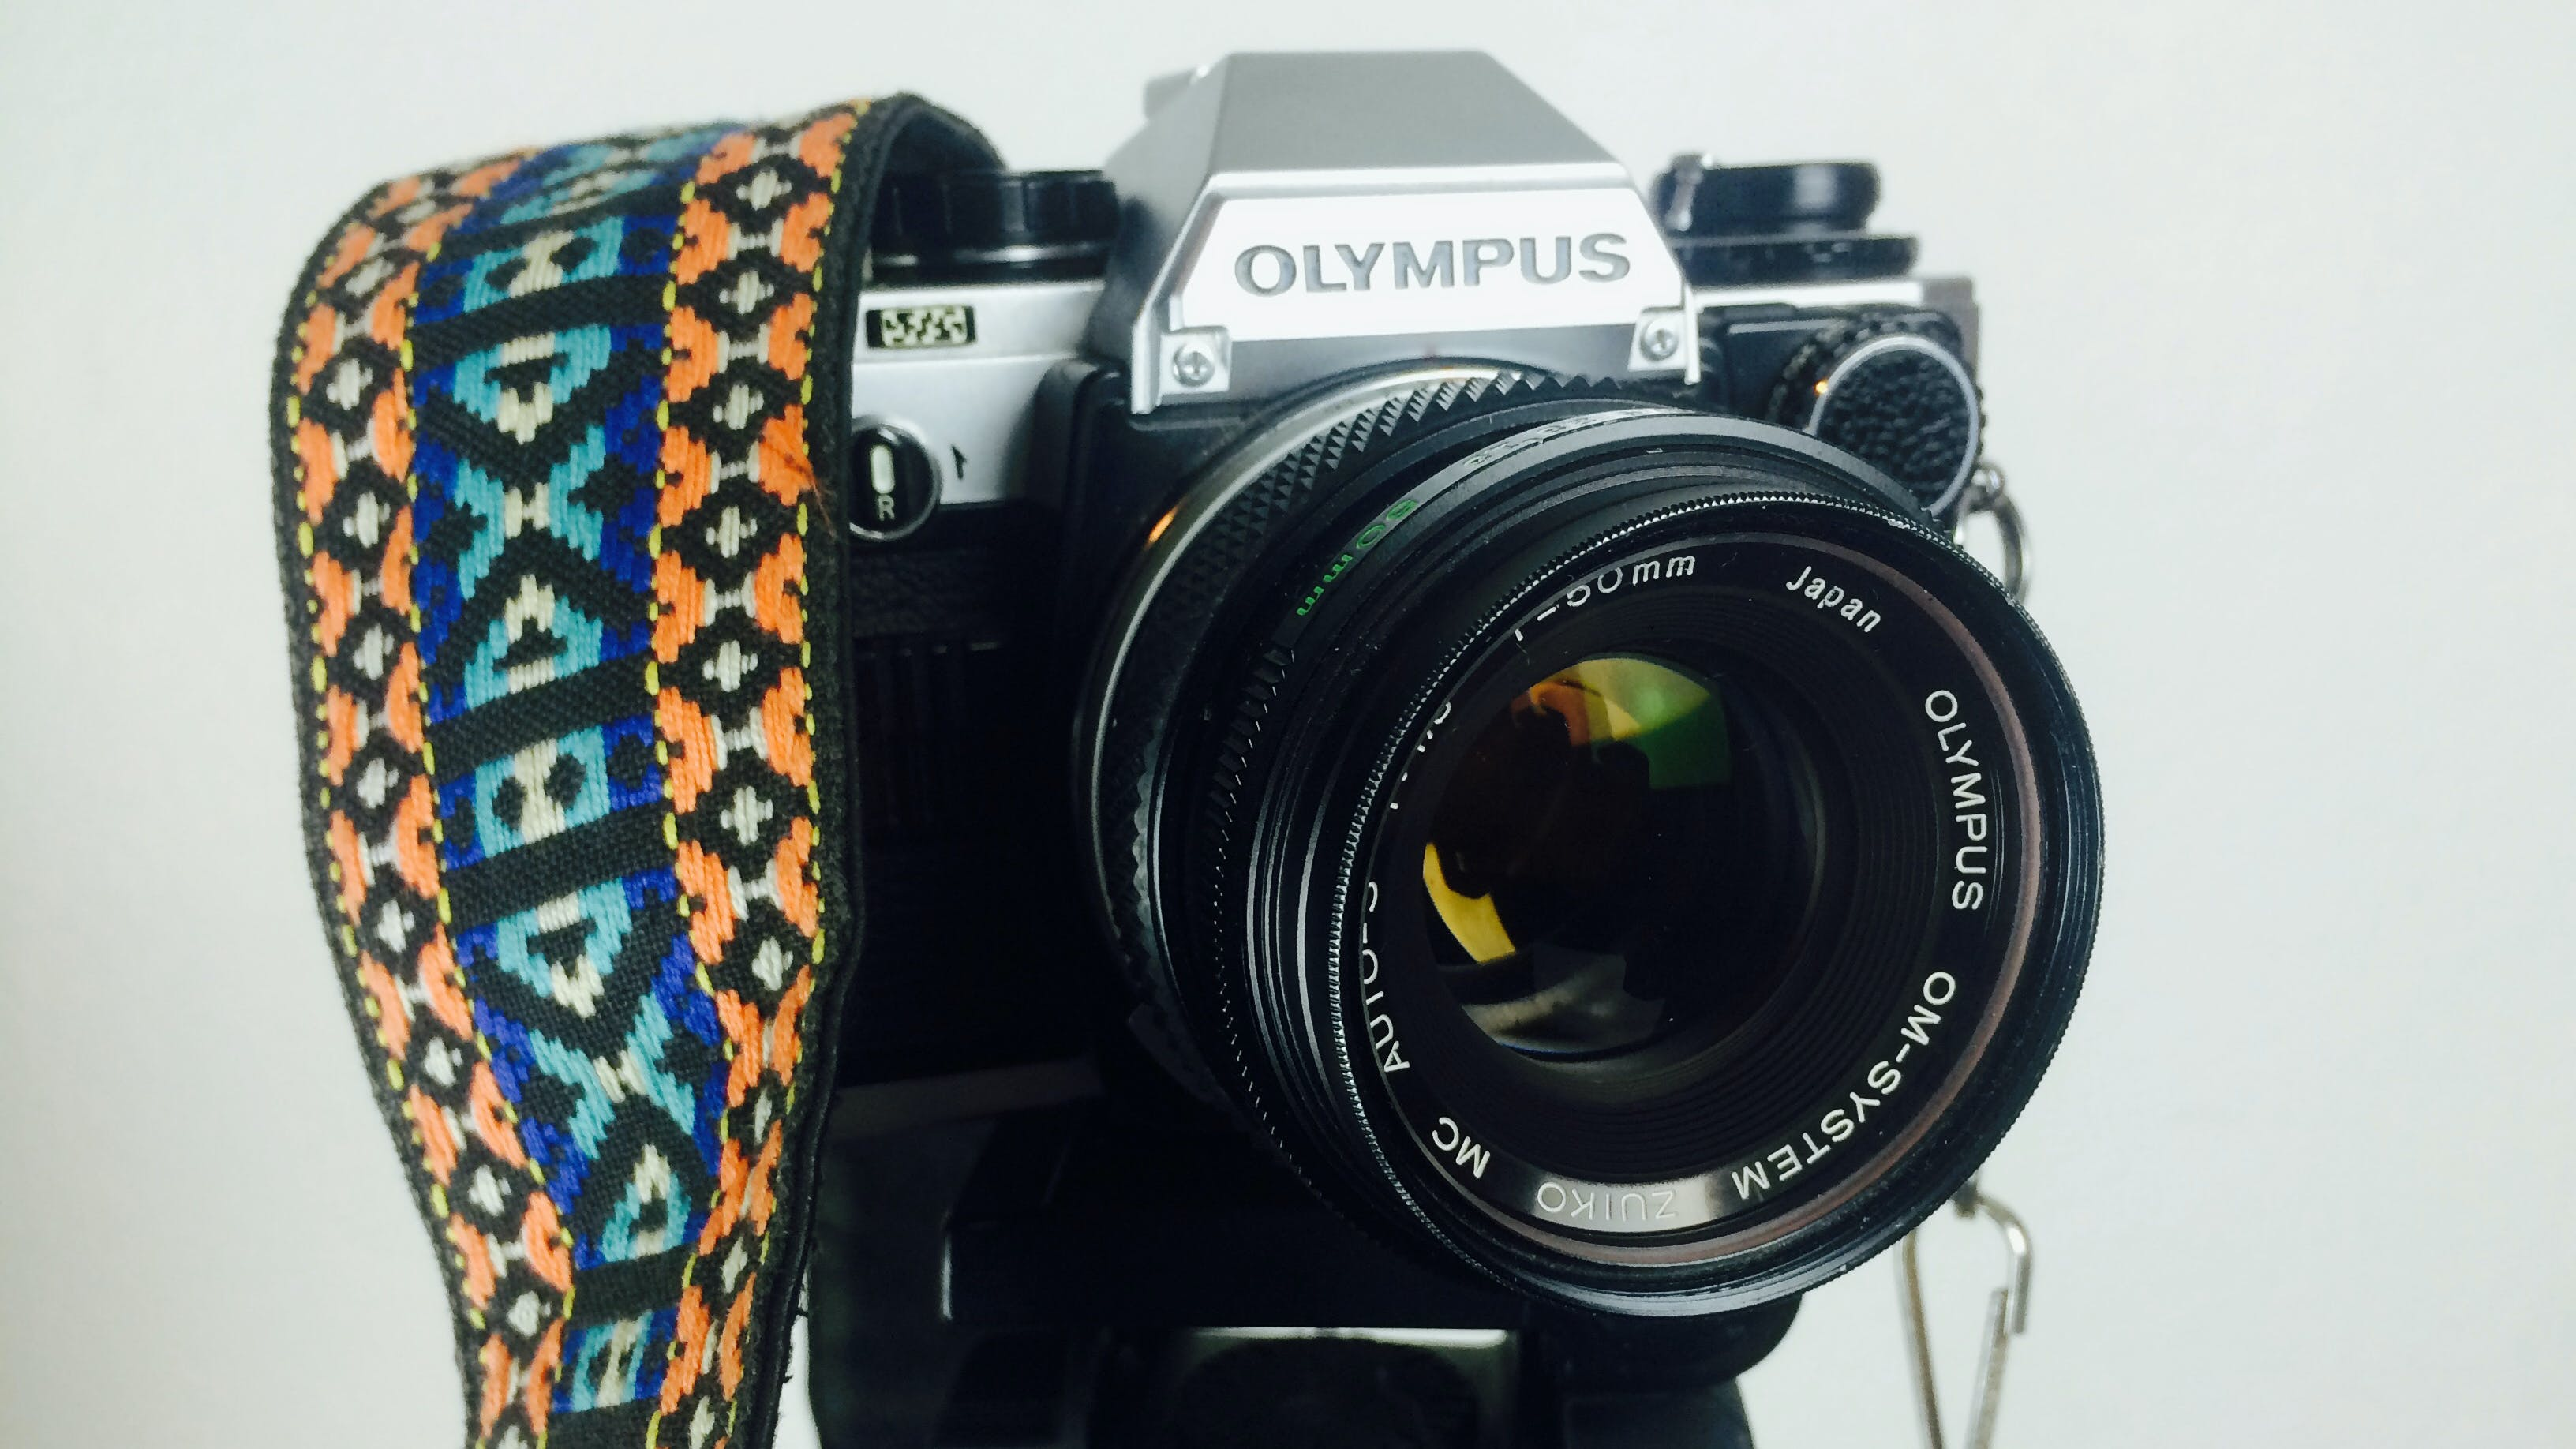 Black and Gray Olympus Dslr Camera White Orange Blue and White Strap